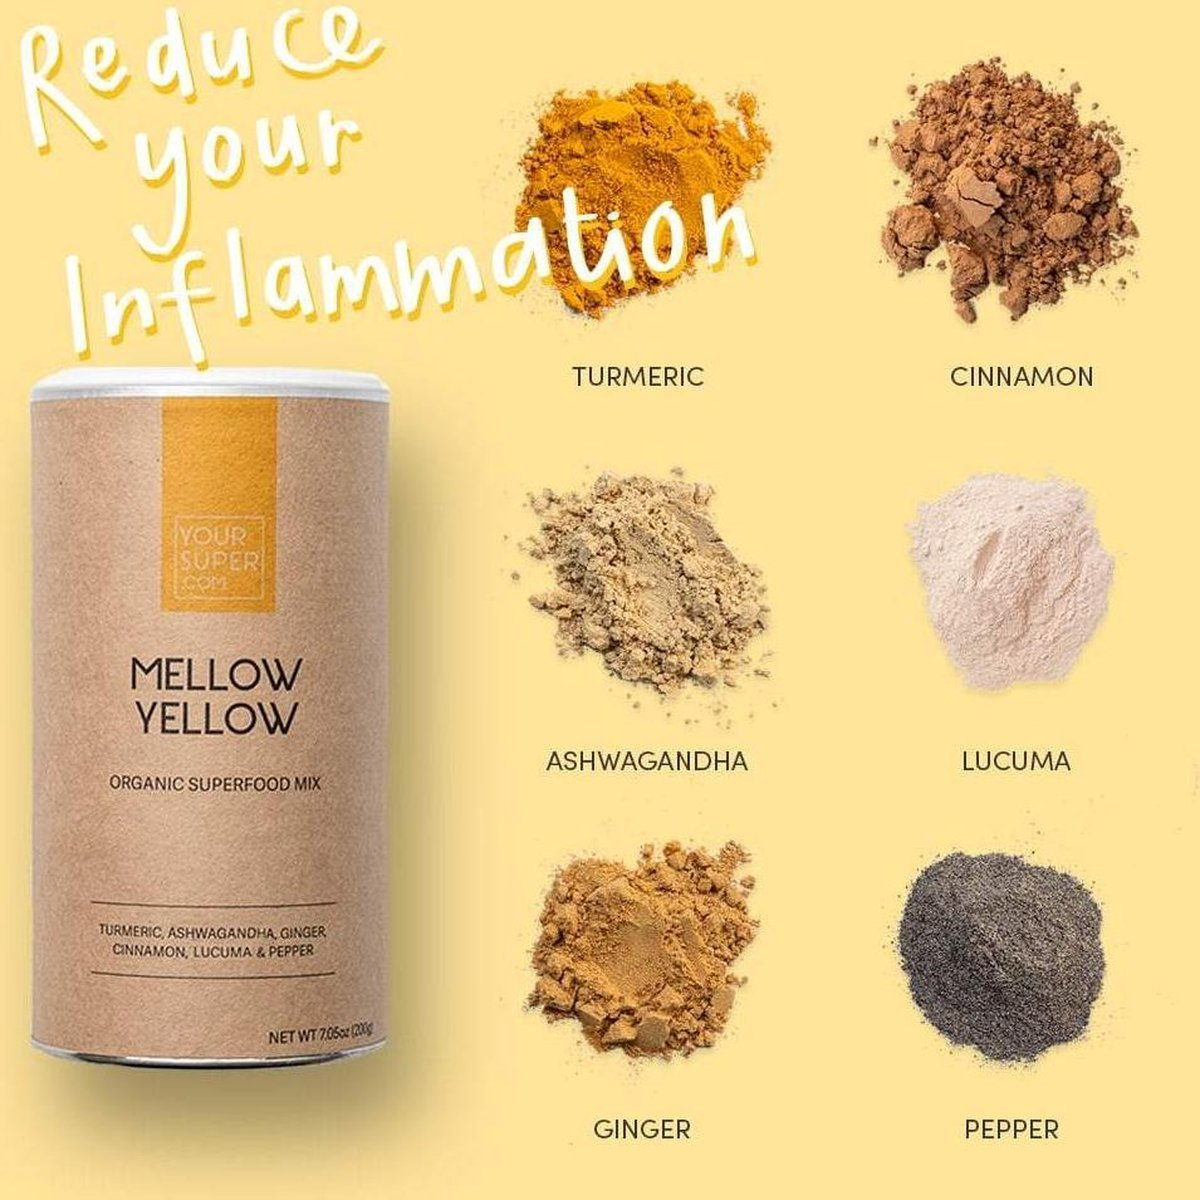 Your Super - GOLDEN MELLOW - Organic Superfood Mix - Plantaardig - Ontspanning - Goed bij Artrose